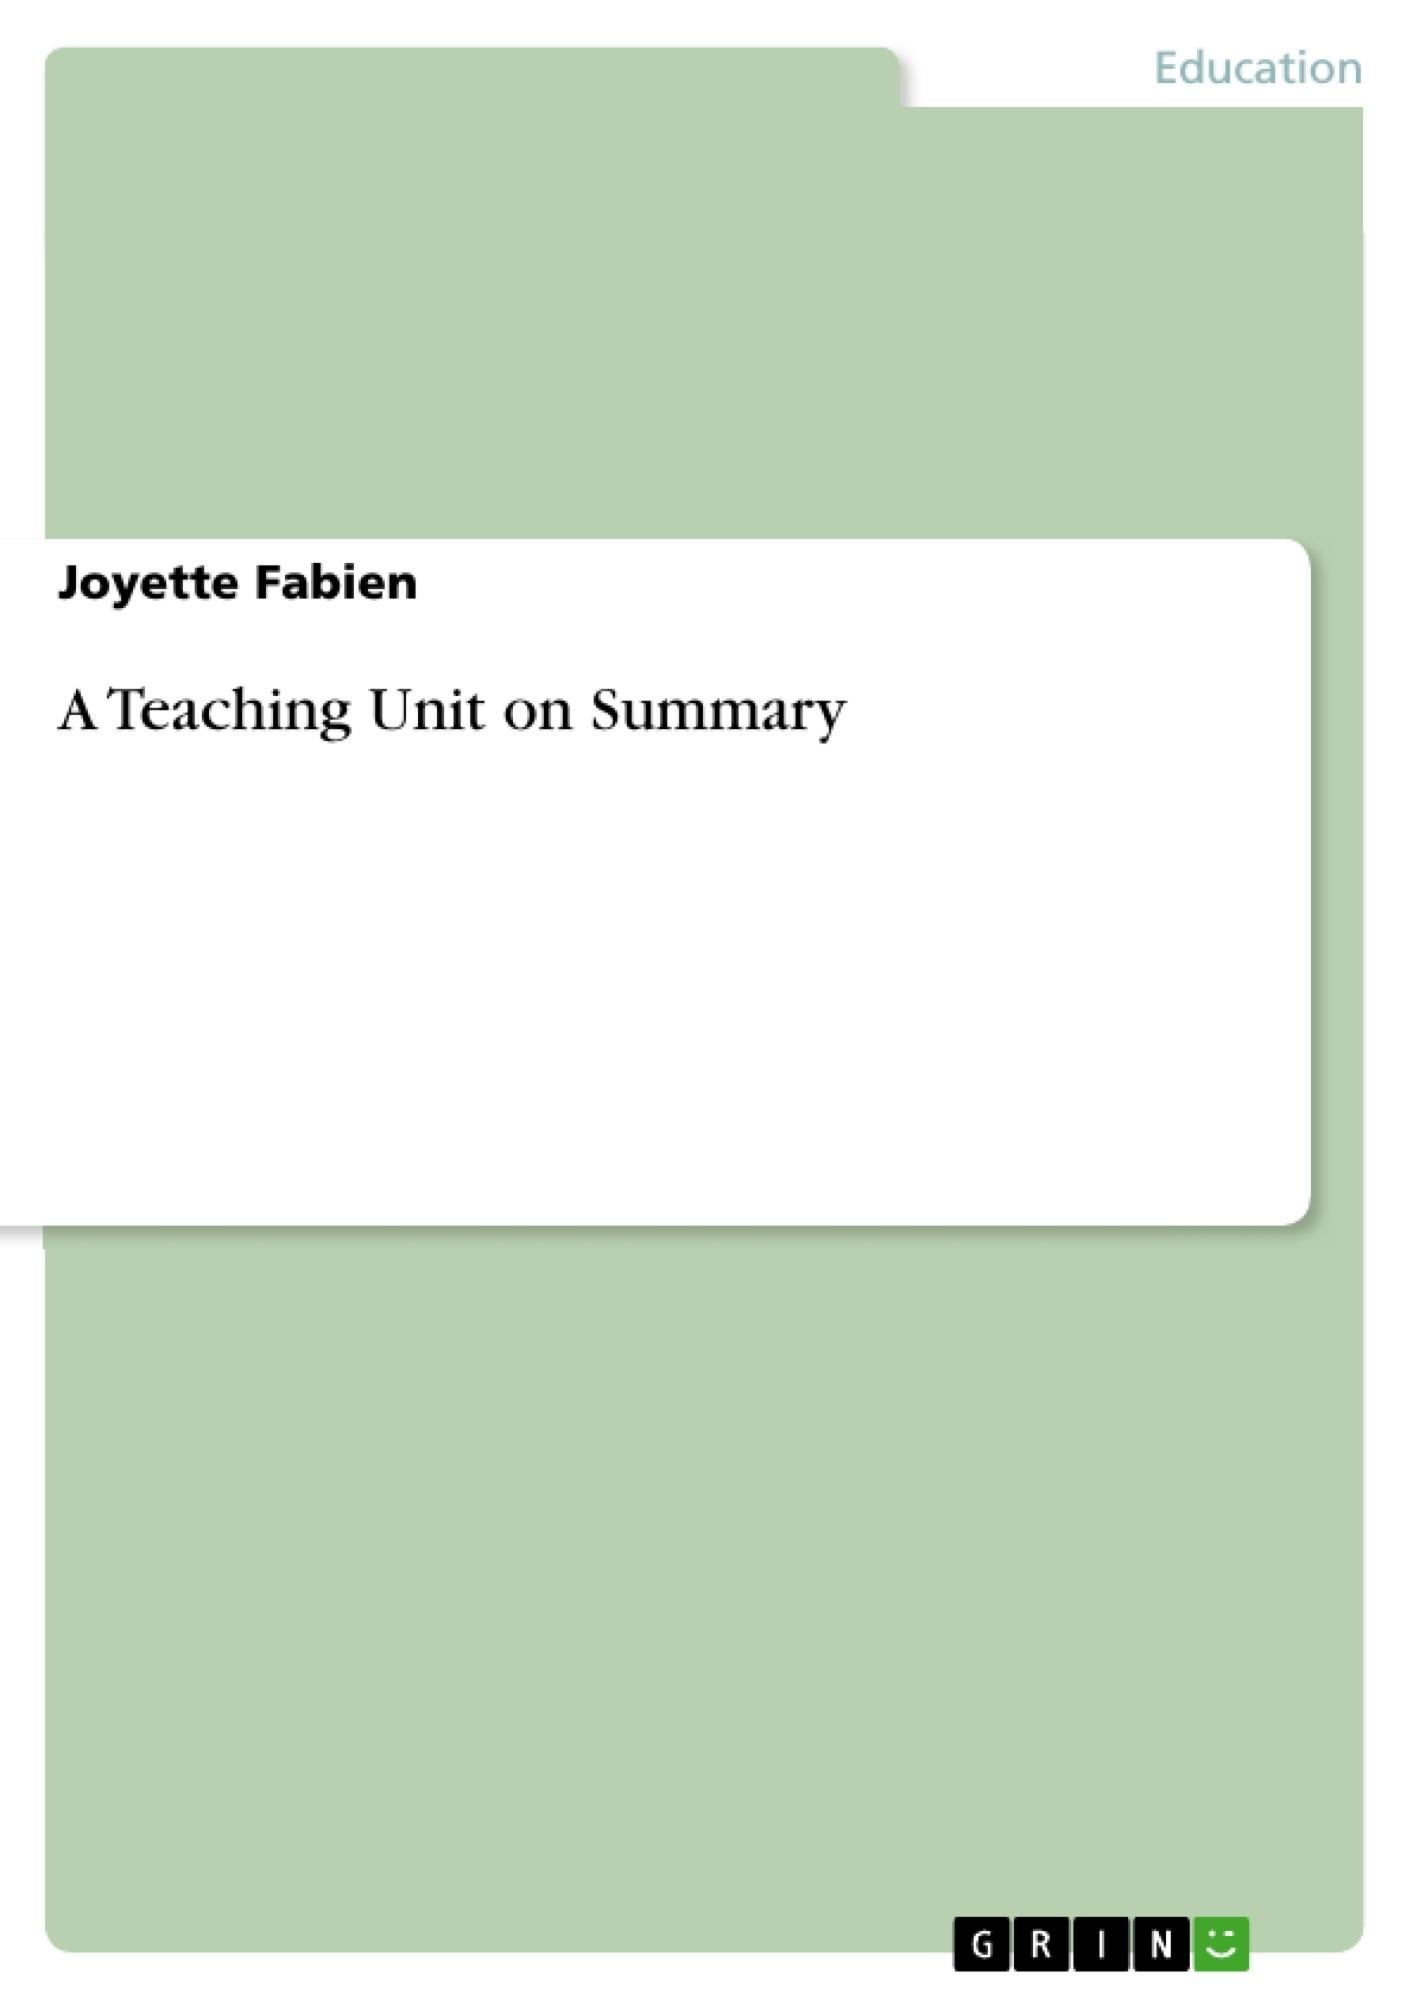 Title: A Teaching Unit on Summary